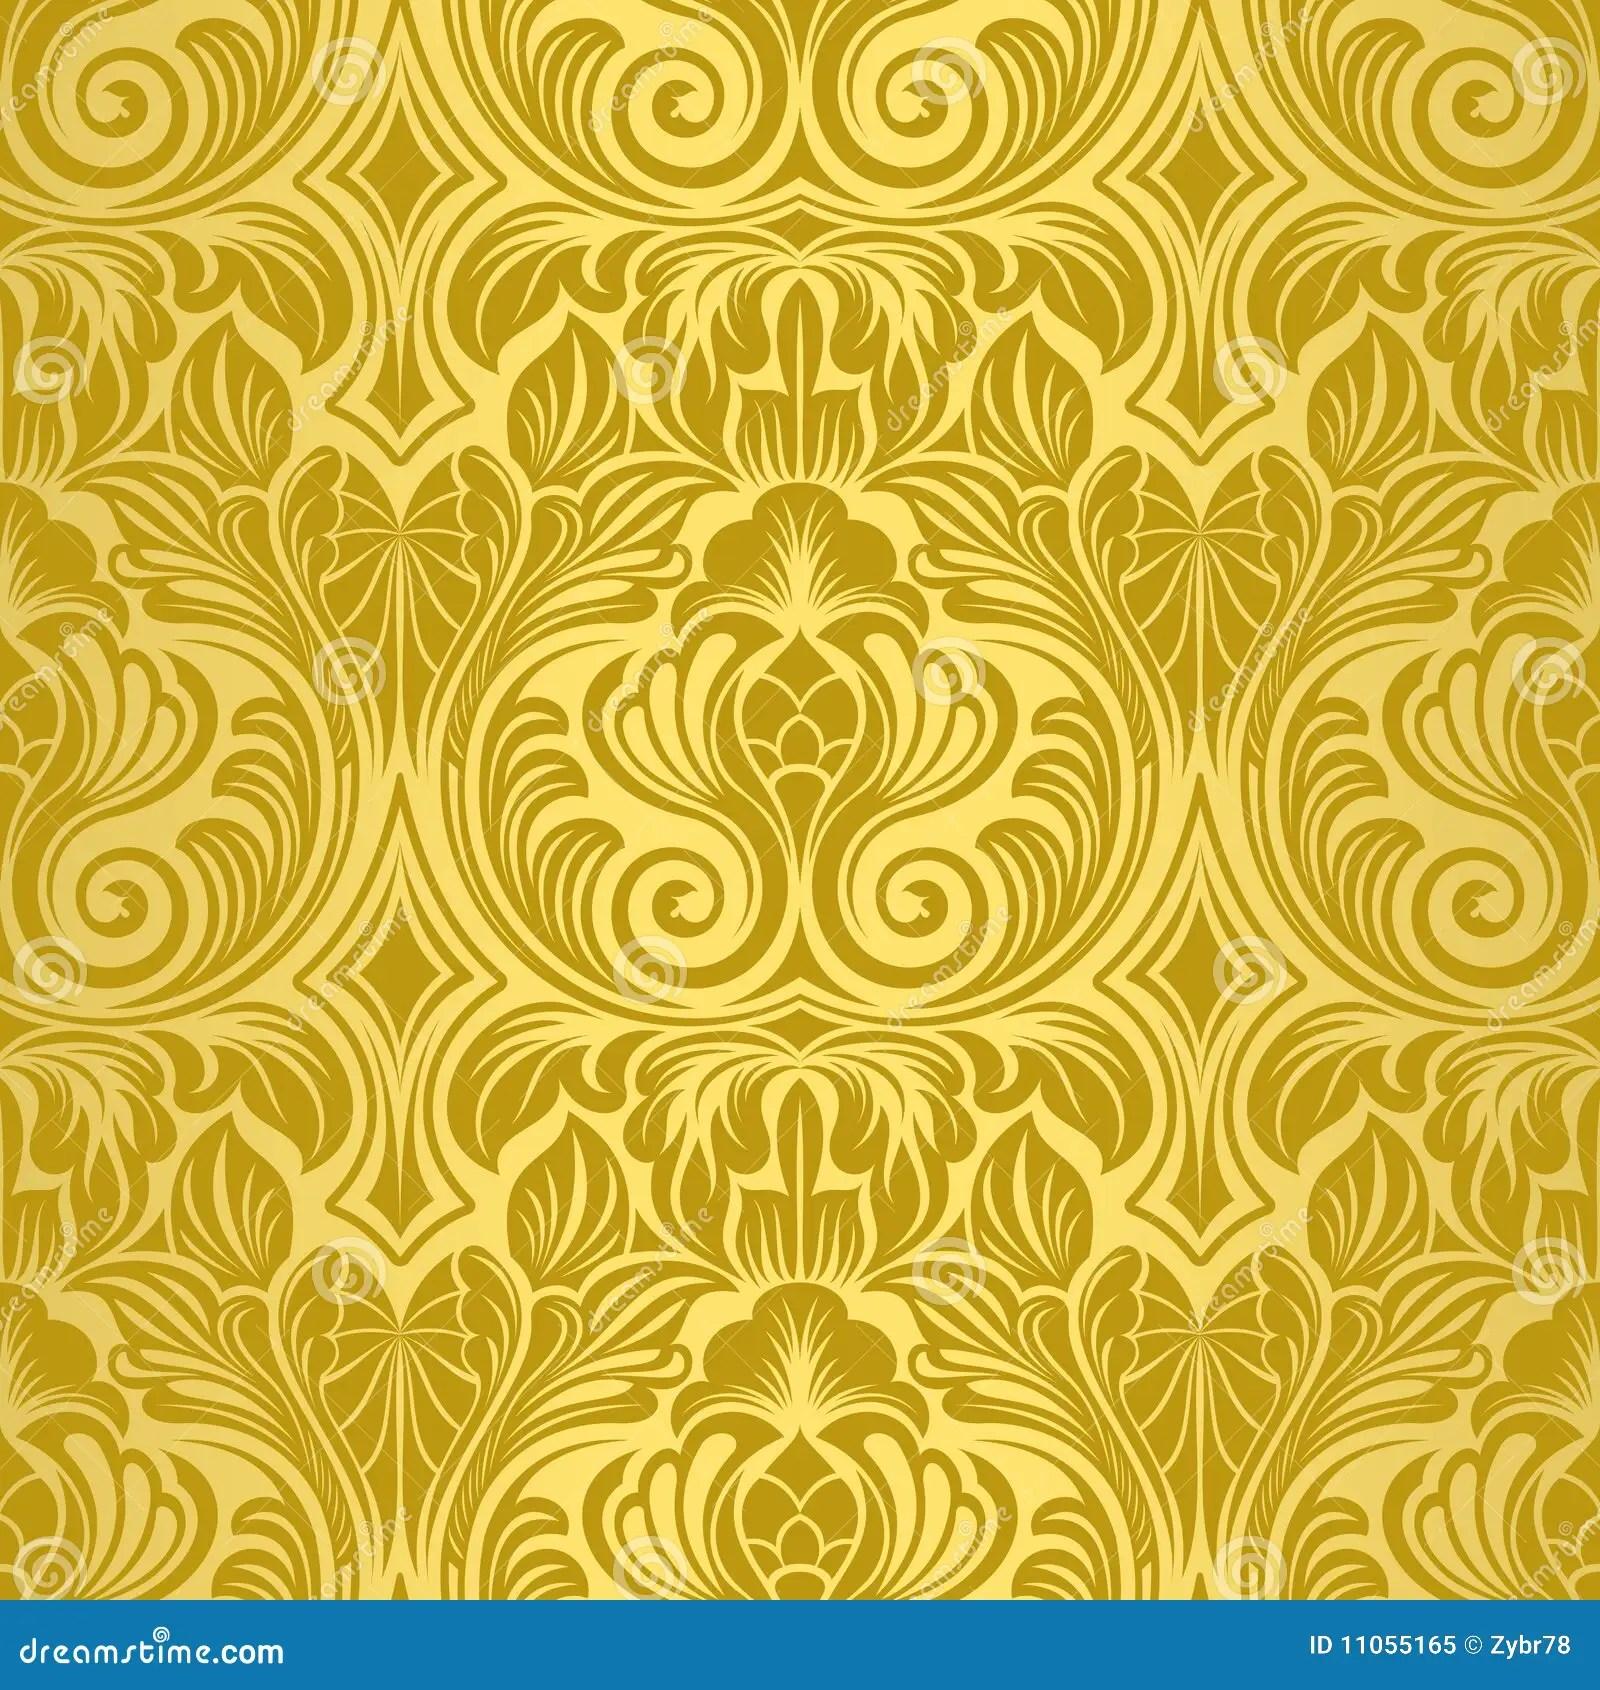 Purple And Black Damask Wallpaper Gold Seamless Wallpaper Stock Vector Illustration Of